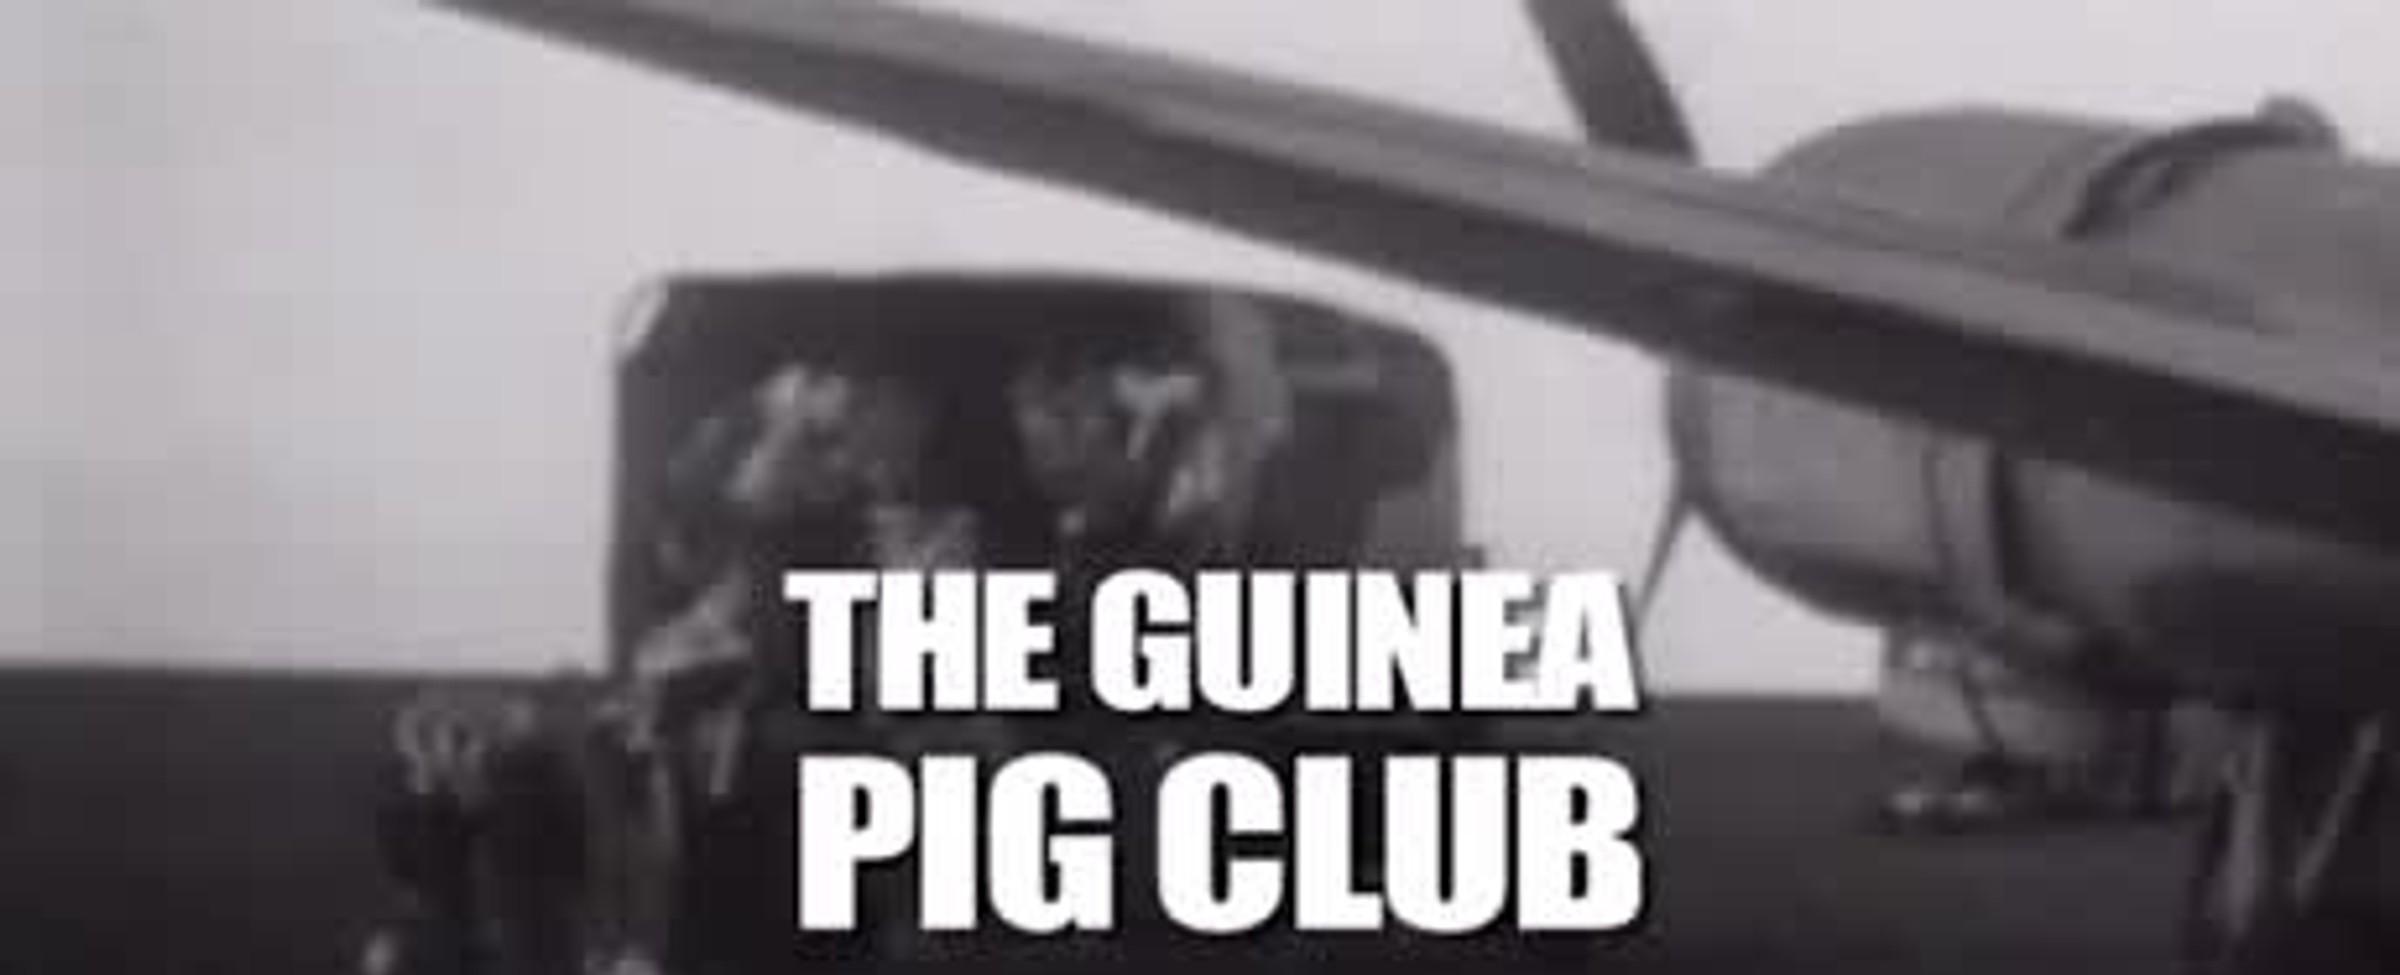 Klub pokusných morčat